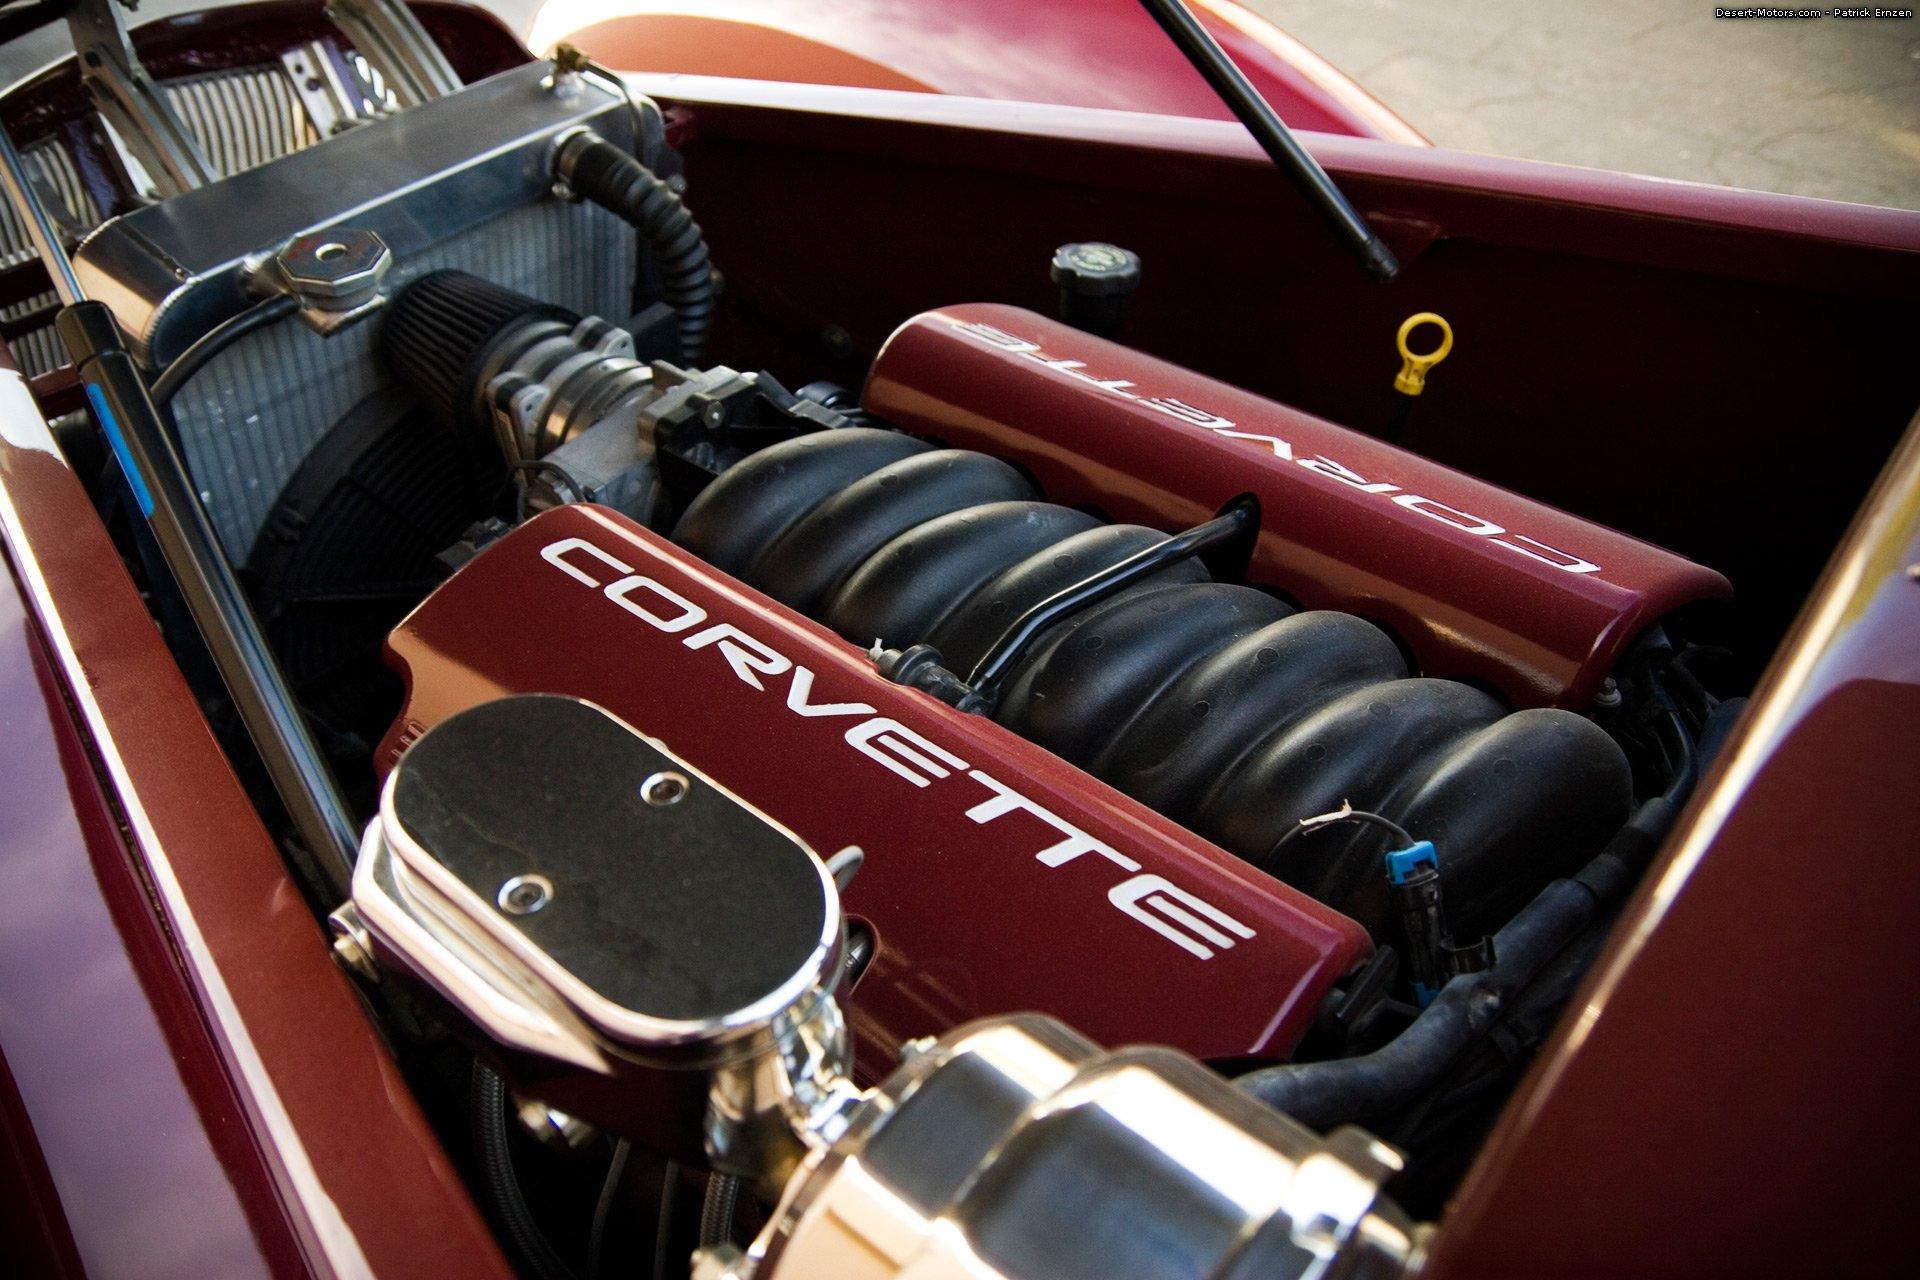 1974 Alfa Romeo Gtv 2000 in addition 281 alfa romeo 2000 spider touring likewise Cutaways also Honda Civic Crx 1988 in addition 7021. on alfa romeo engine